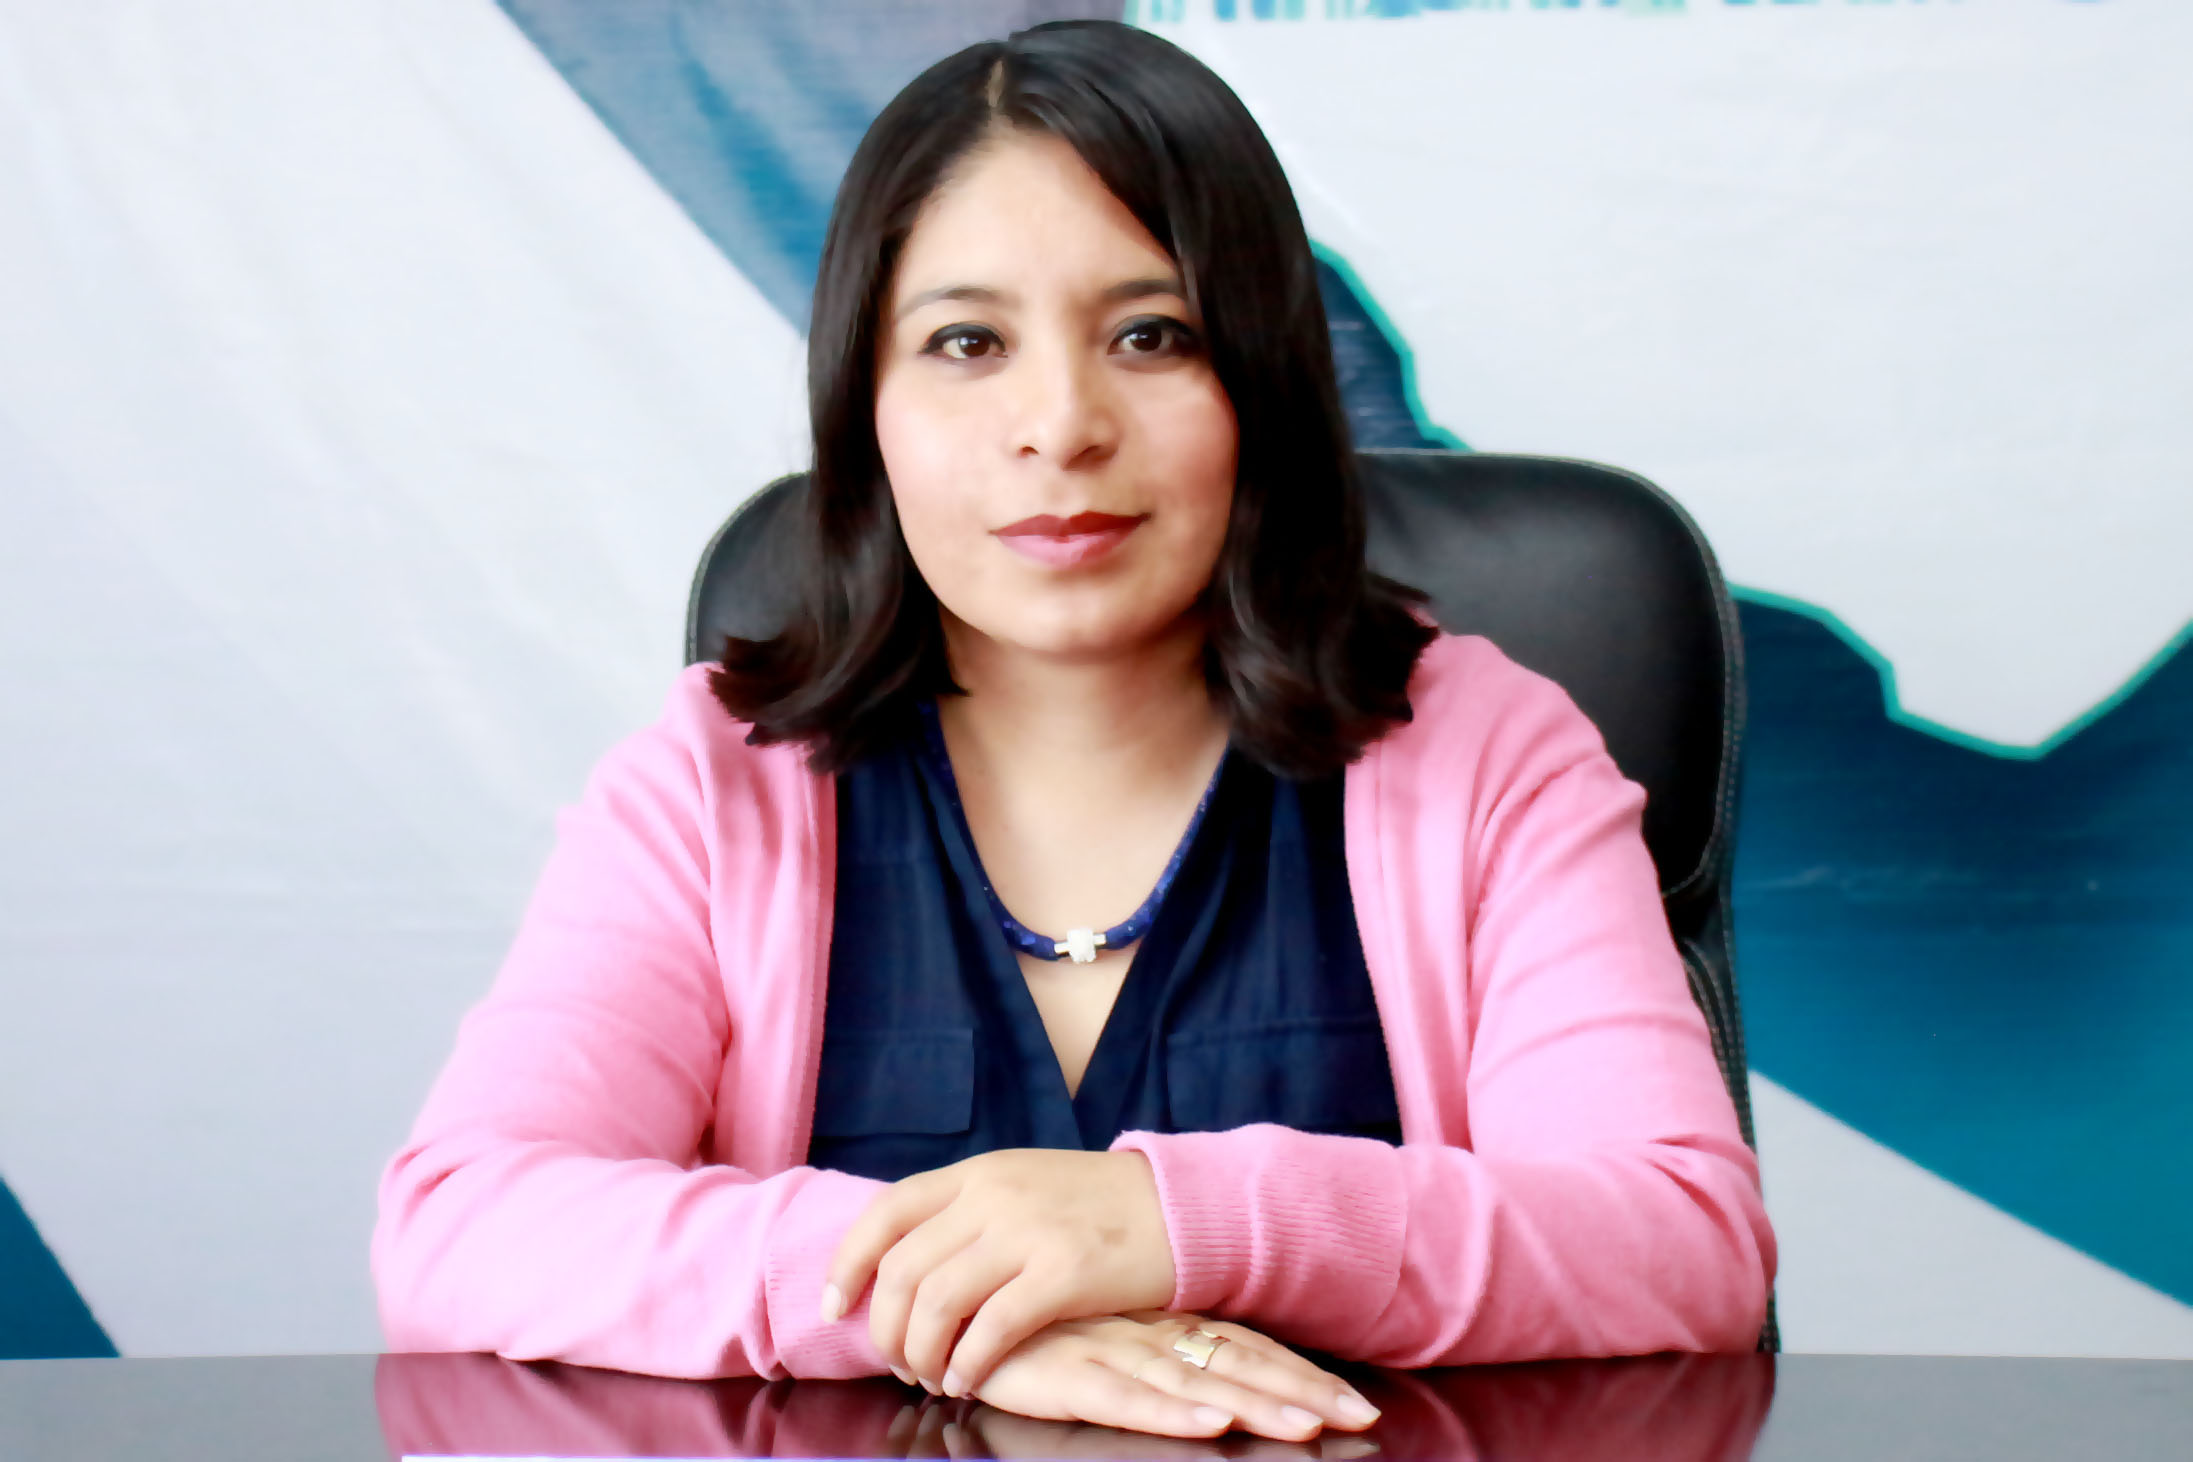 Lic. Mónica Cuamatzi Hernández